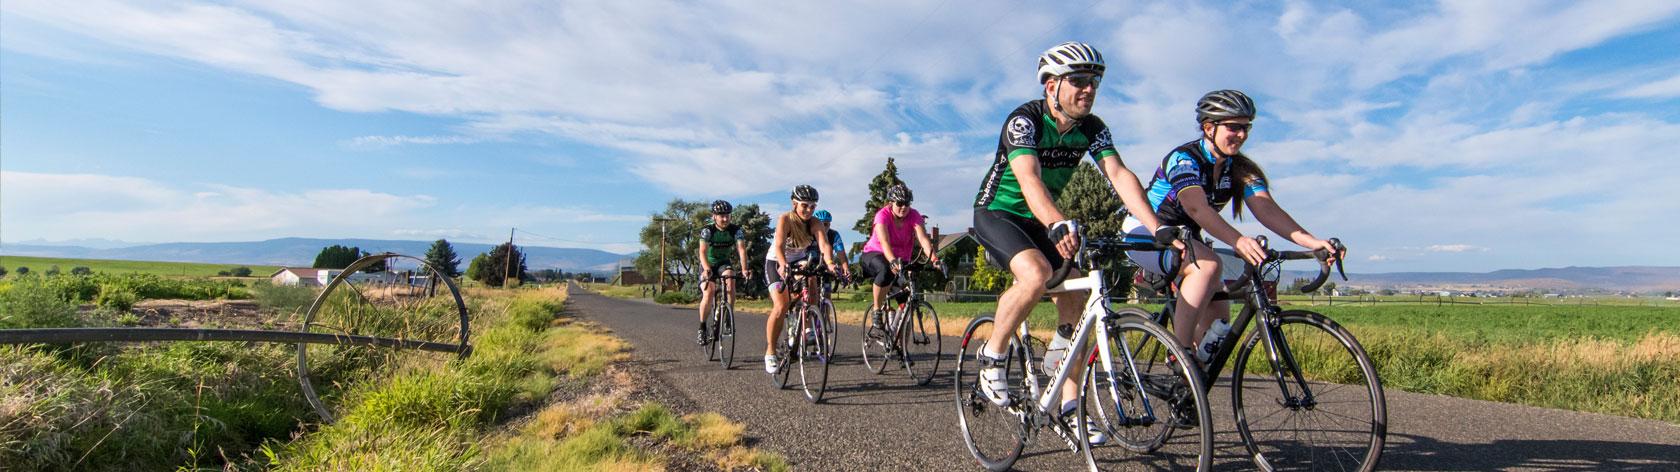 Tacoma WA Bicycle Club - Headwaters Century